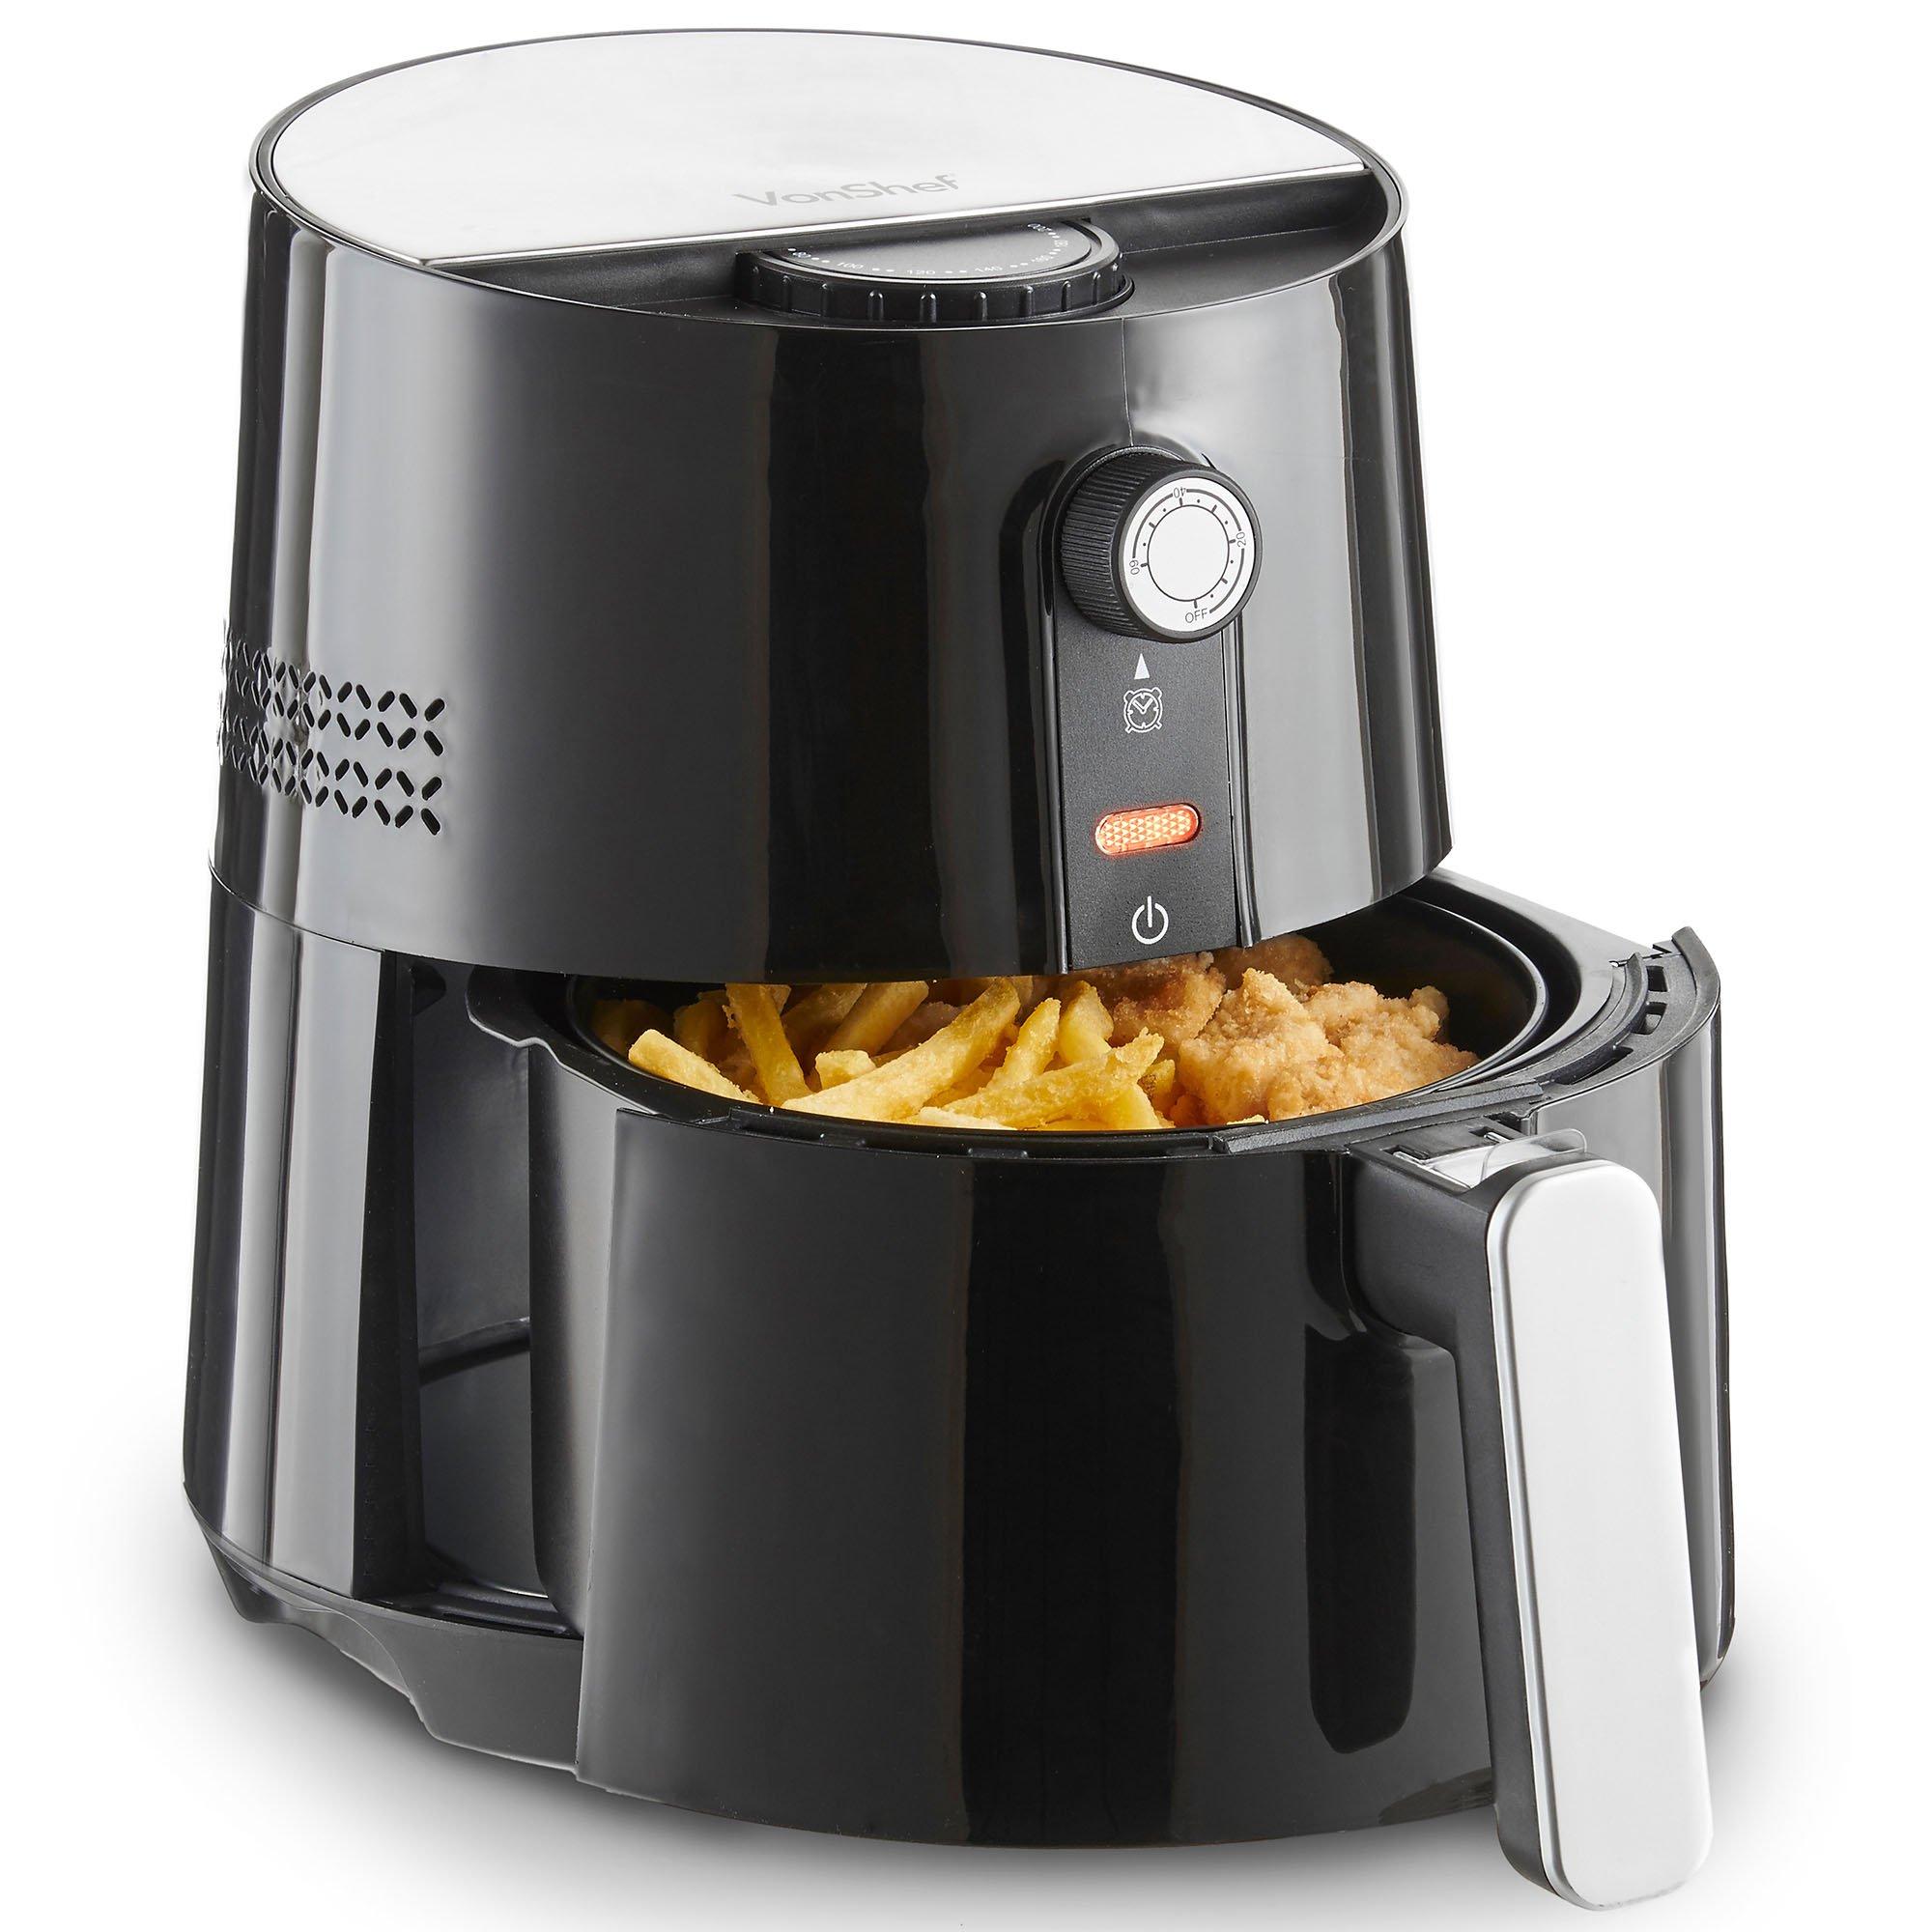 VonShef 3 Quart Electric Hot Air Fryer, Oil Free Healthier Alternative to Deep Frying, Adjustable Temperature Control, 1400W, Black Deep Fryer